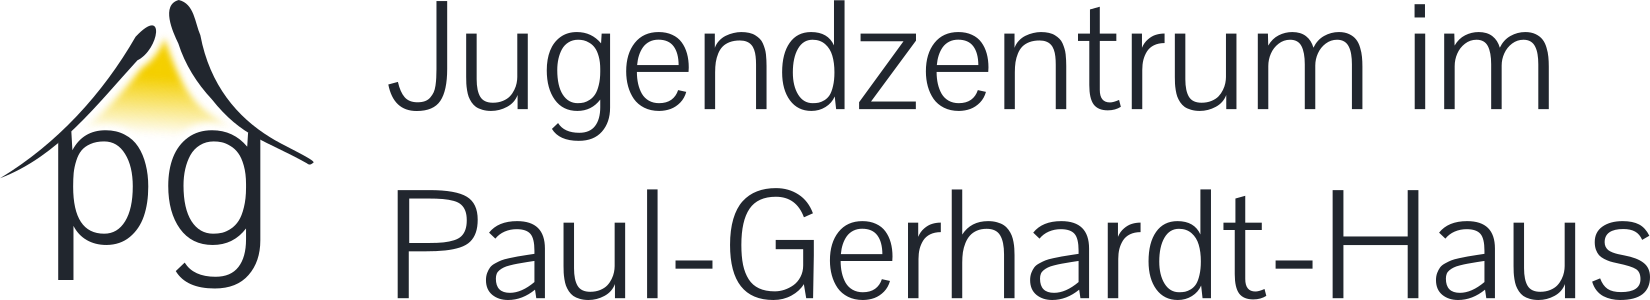 Jugendzentrum im Paul-Gerhardt Haus